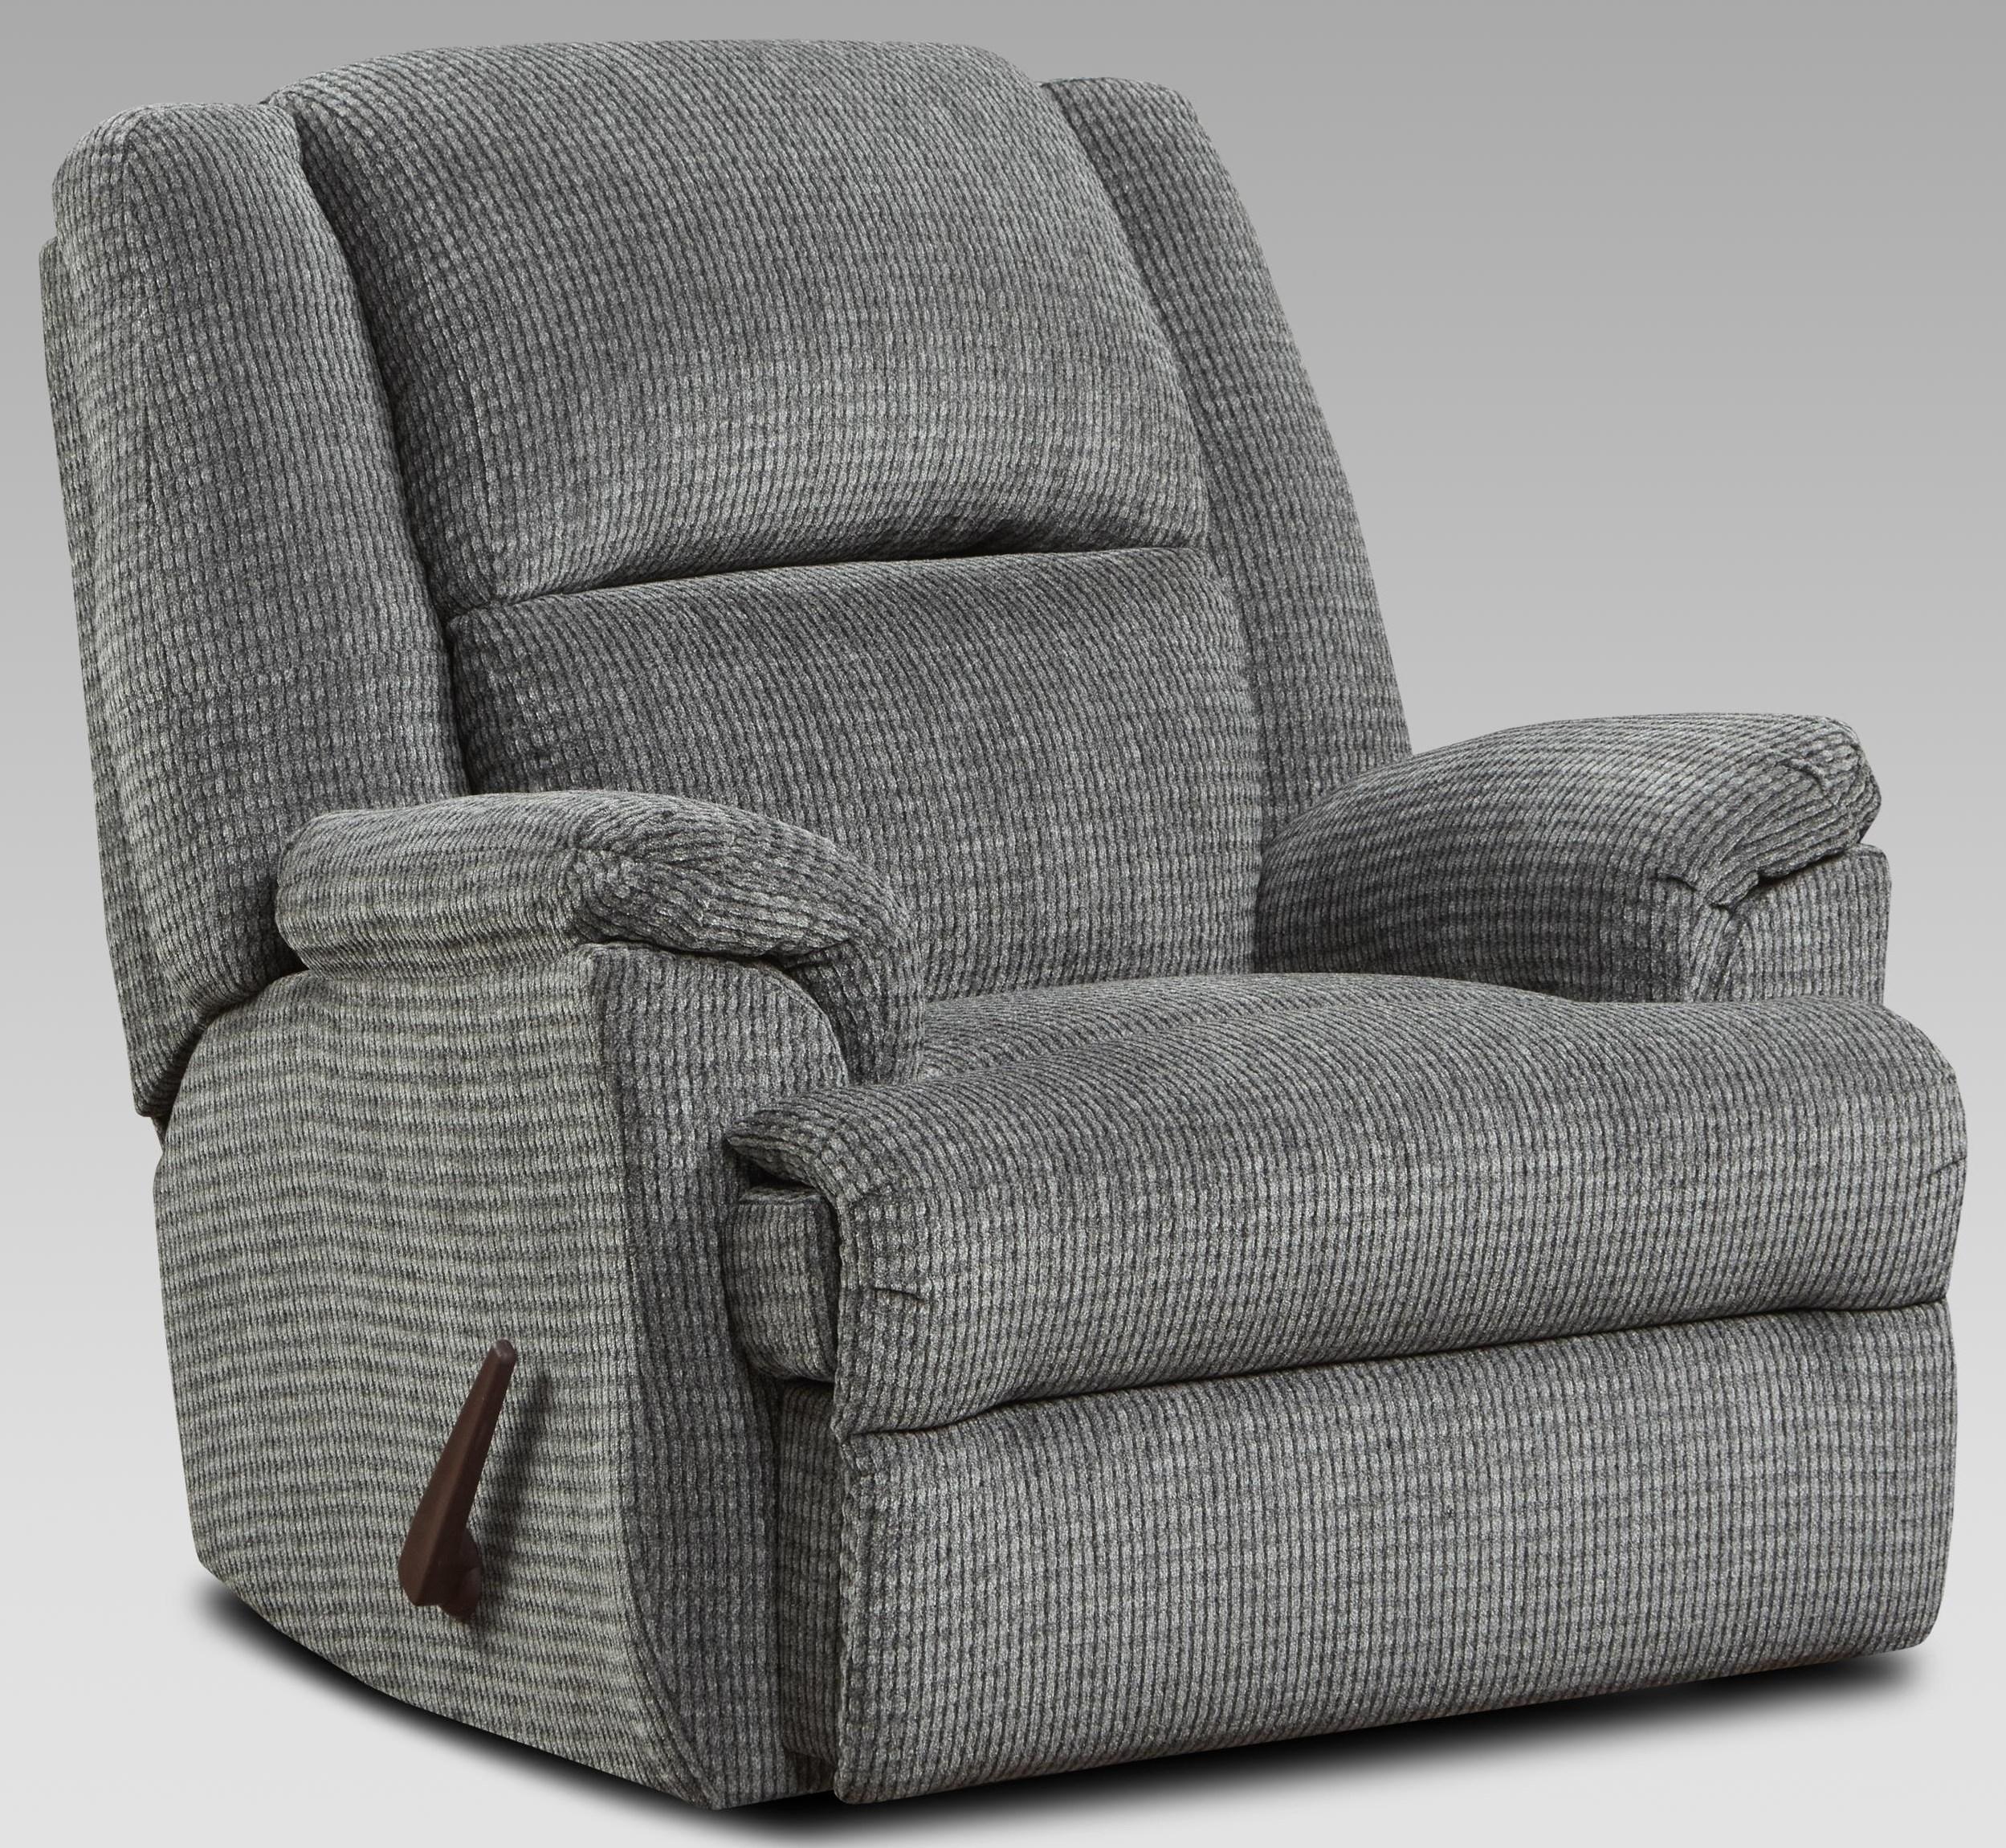 2600 2600 PEWTER RECLINER by Affordable Furniture at Furniture Fair - North Carolina